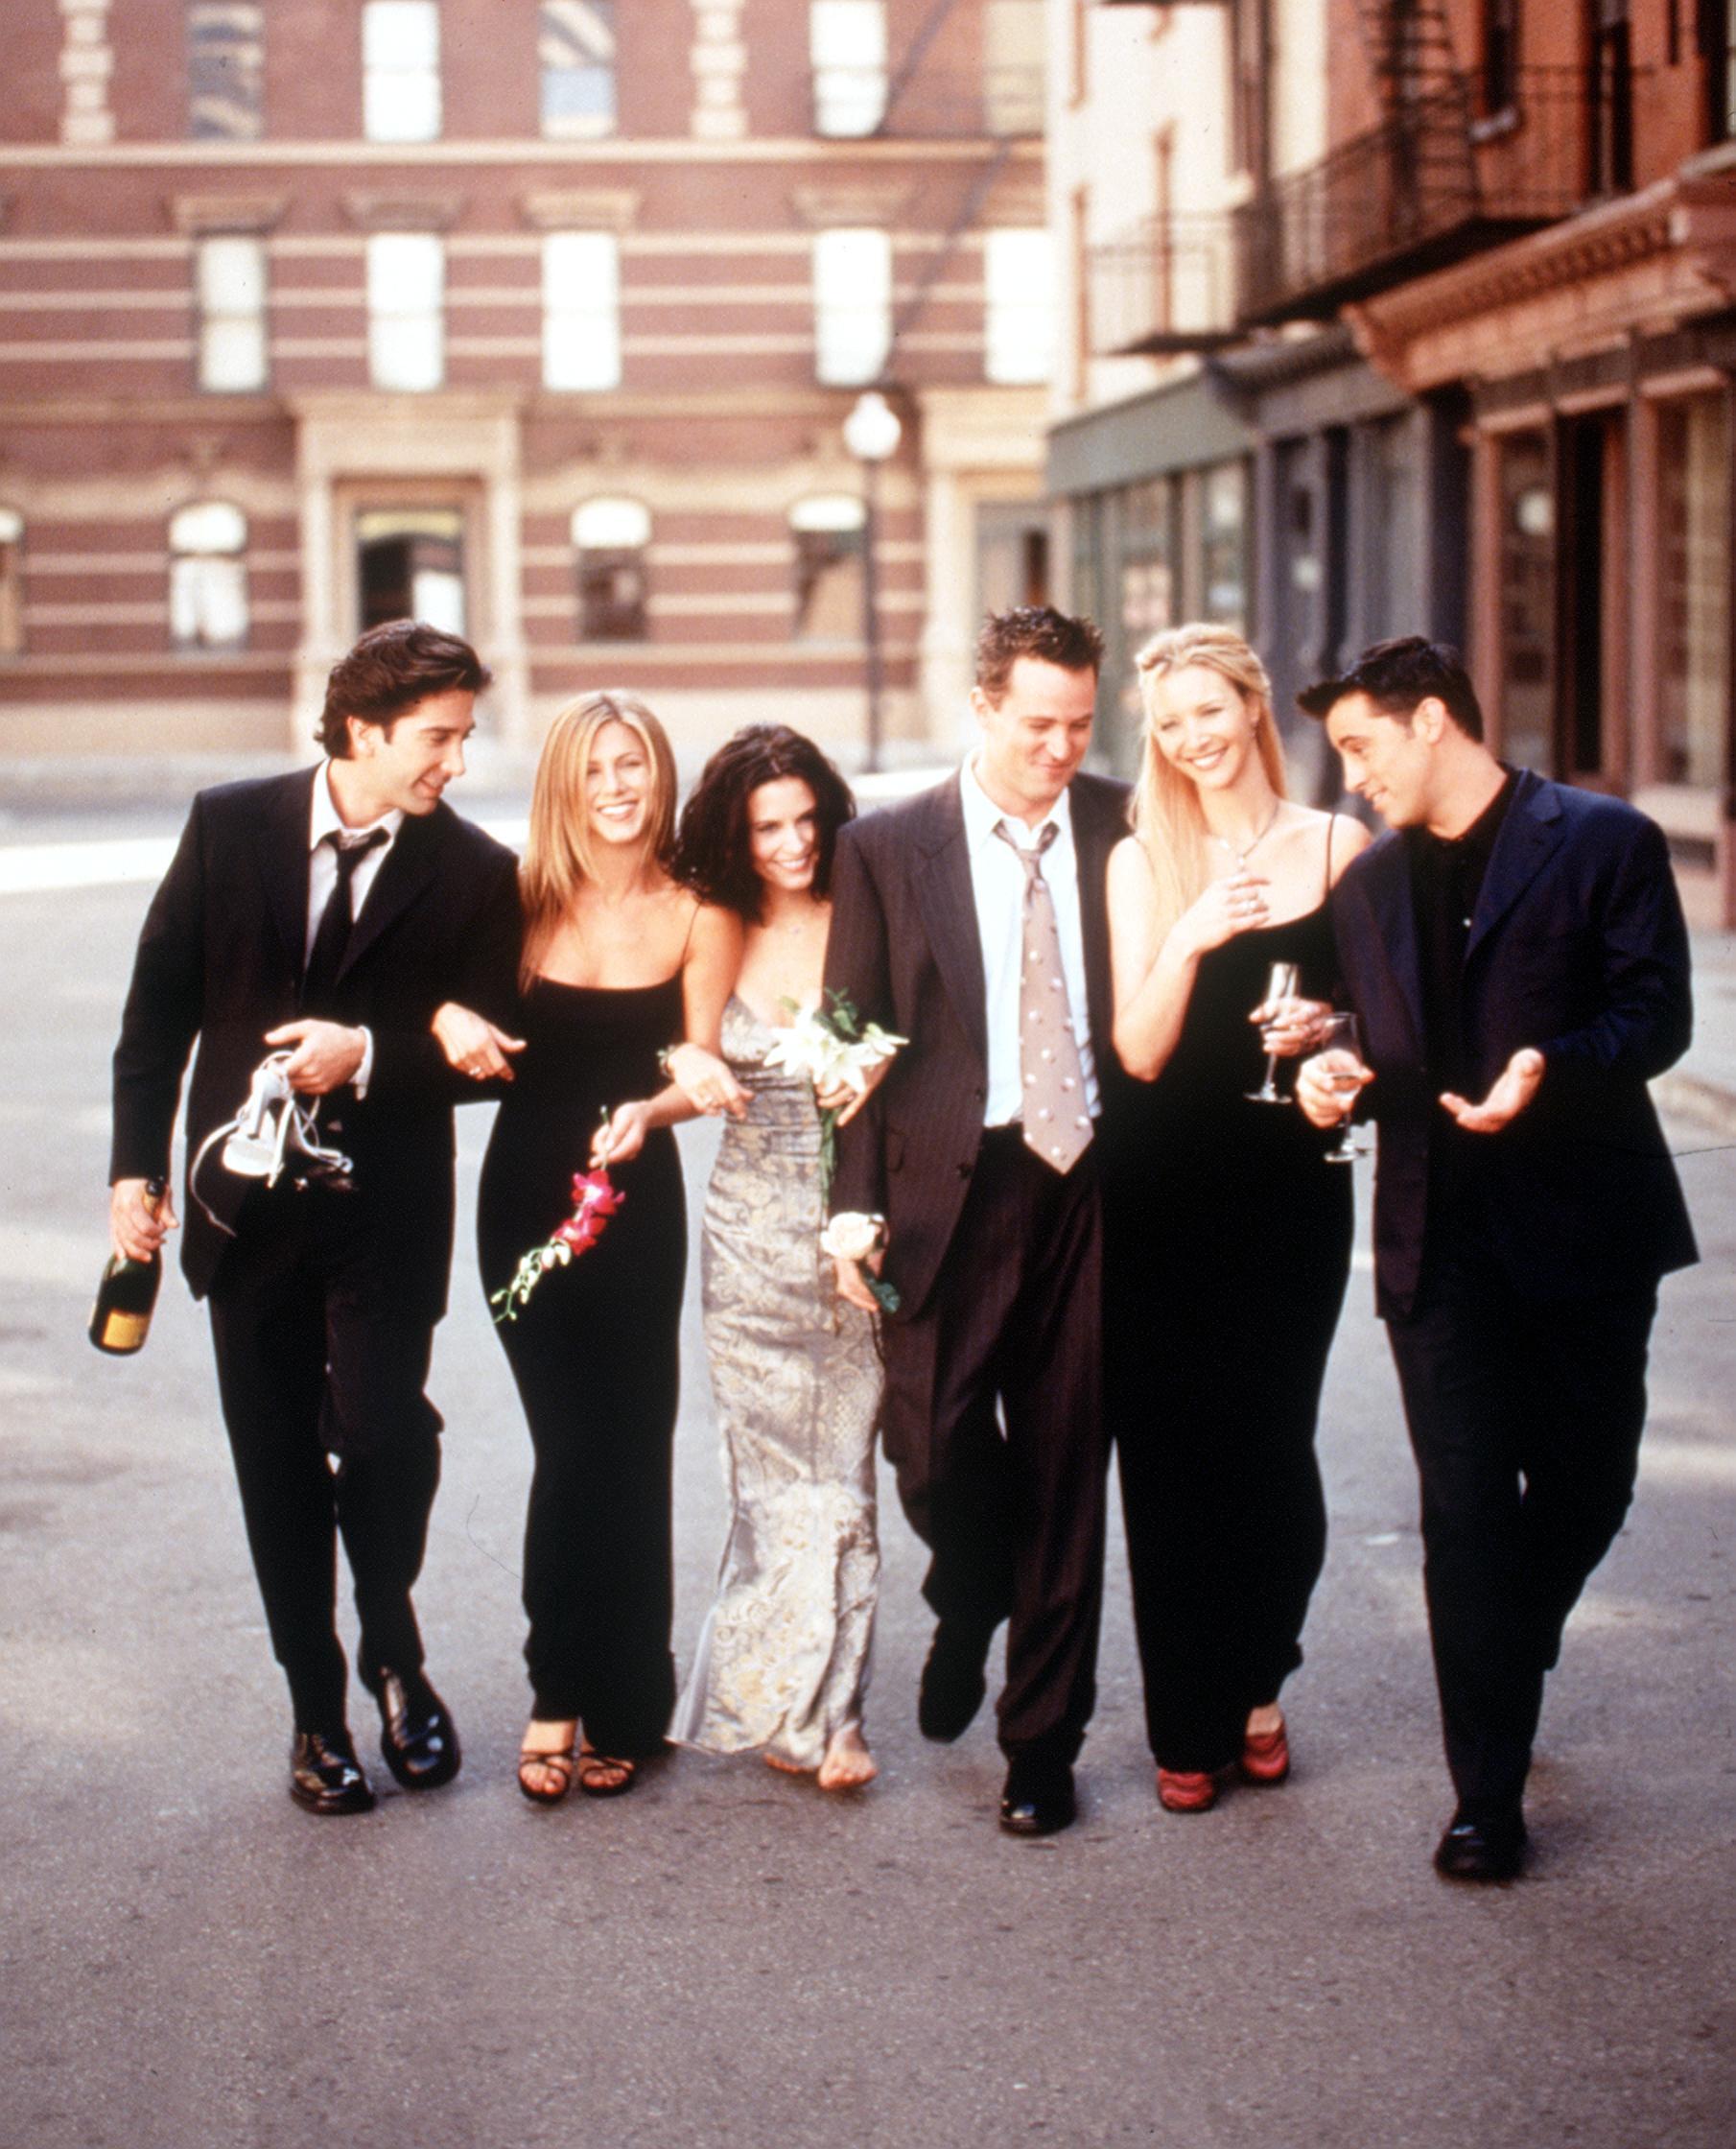 The cast of Friends. From left: David Schwimmer, Jennifer Aniston, Courtney Cox, Matthew Perry, Lisa Kudrow and Matt Leblanc.